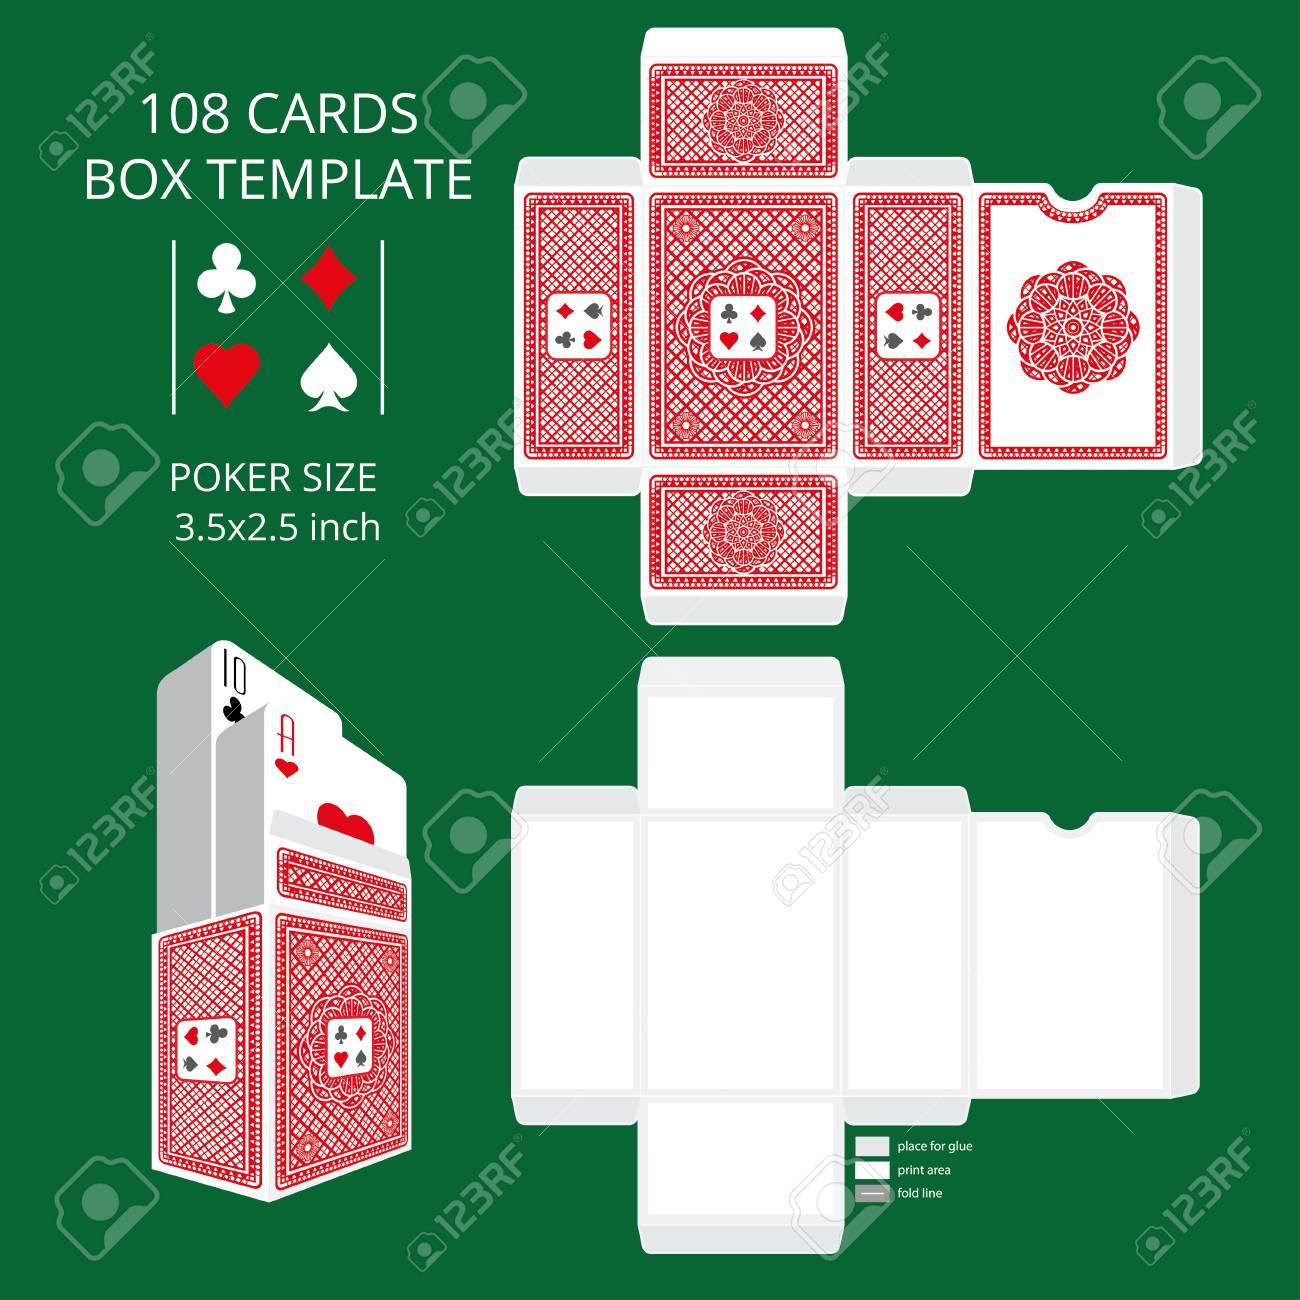 Poker Card Size Tuck Box Template Vector Illustration Ready Design